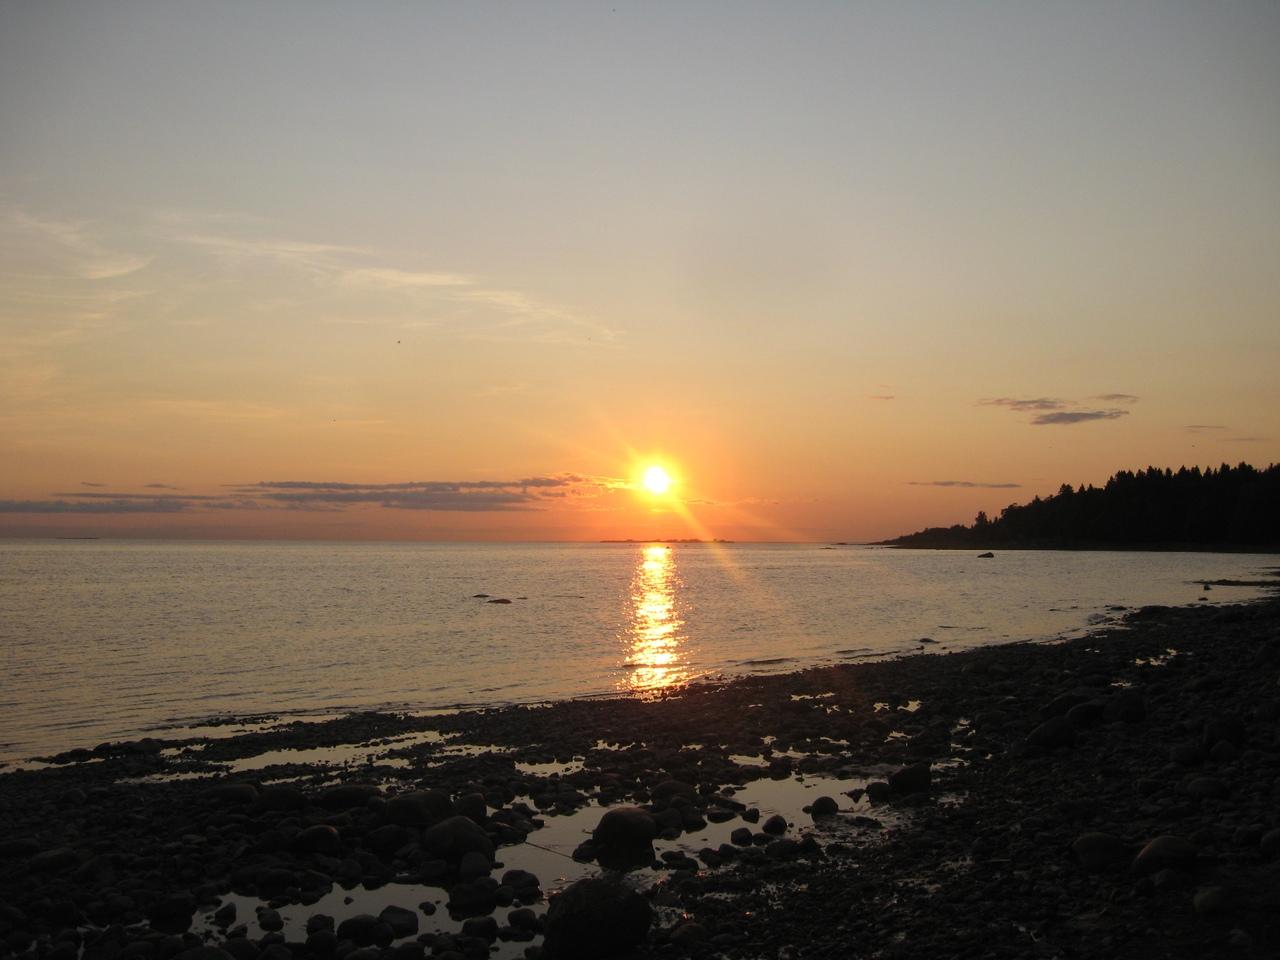 Тарховская коса. Вечерняя прогулка по Финскому заливу.